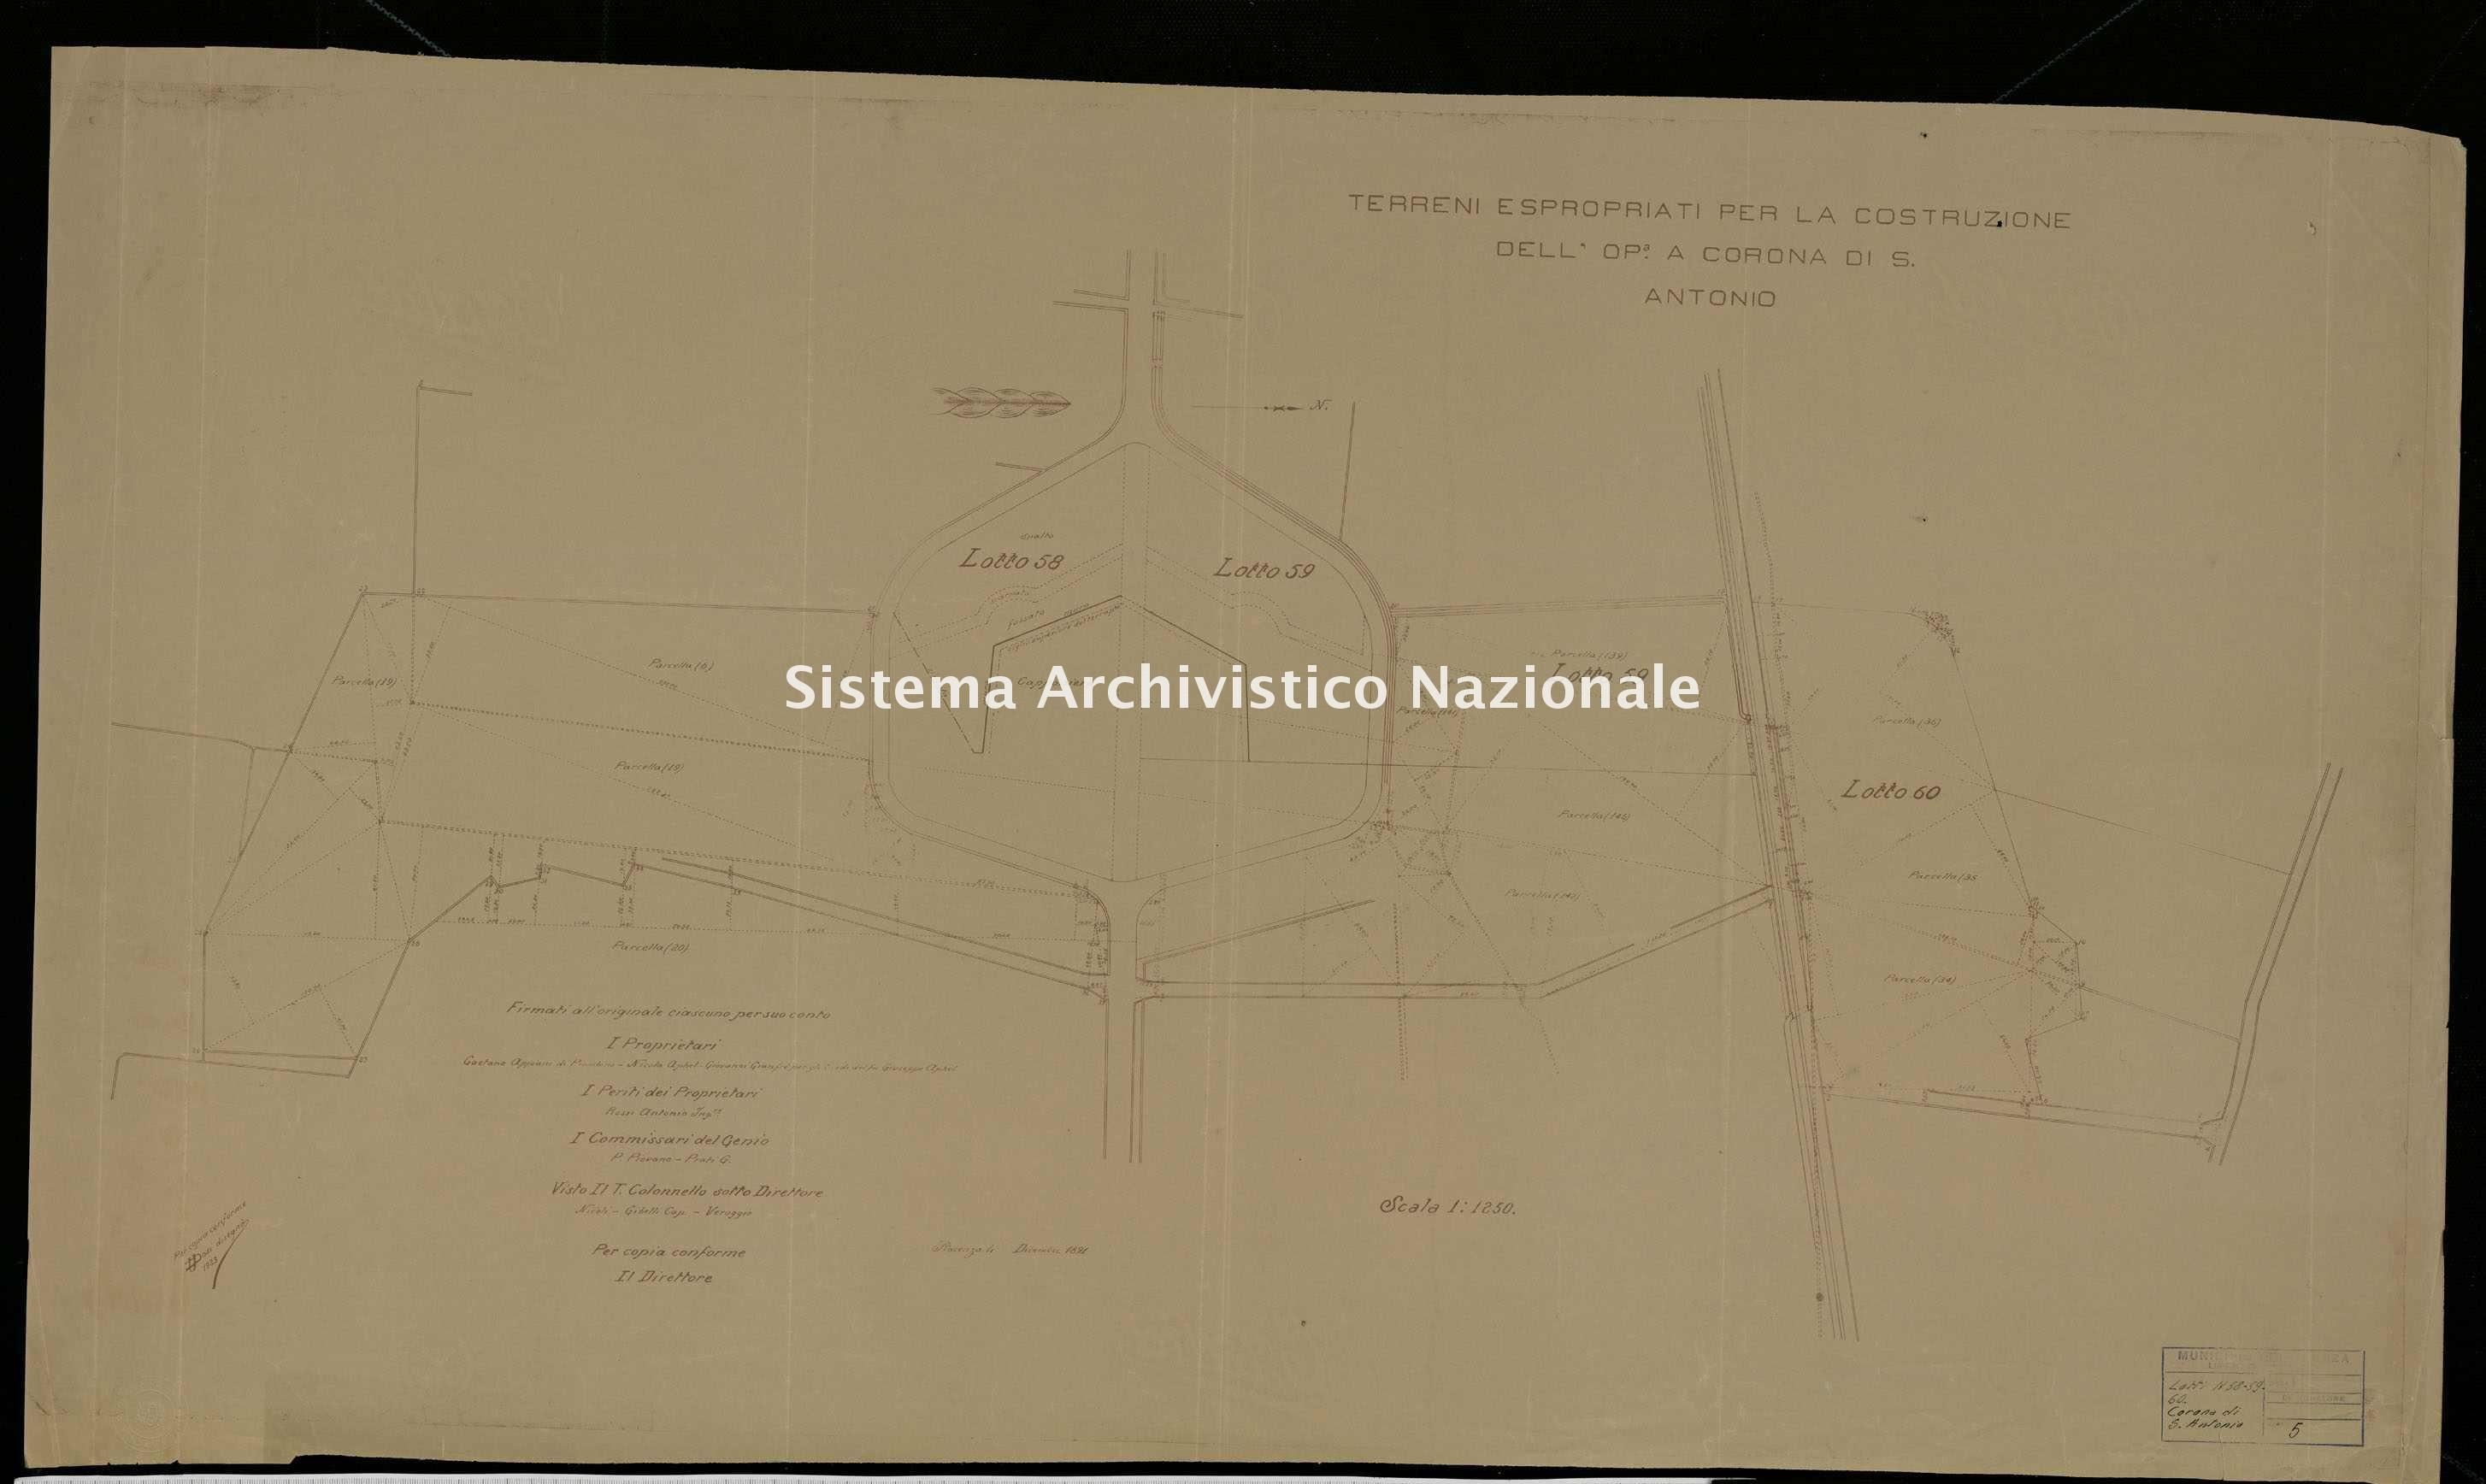 ASPC Mappe, stampe e disegni, n. 5130